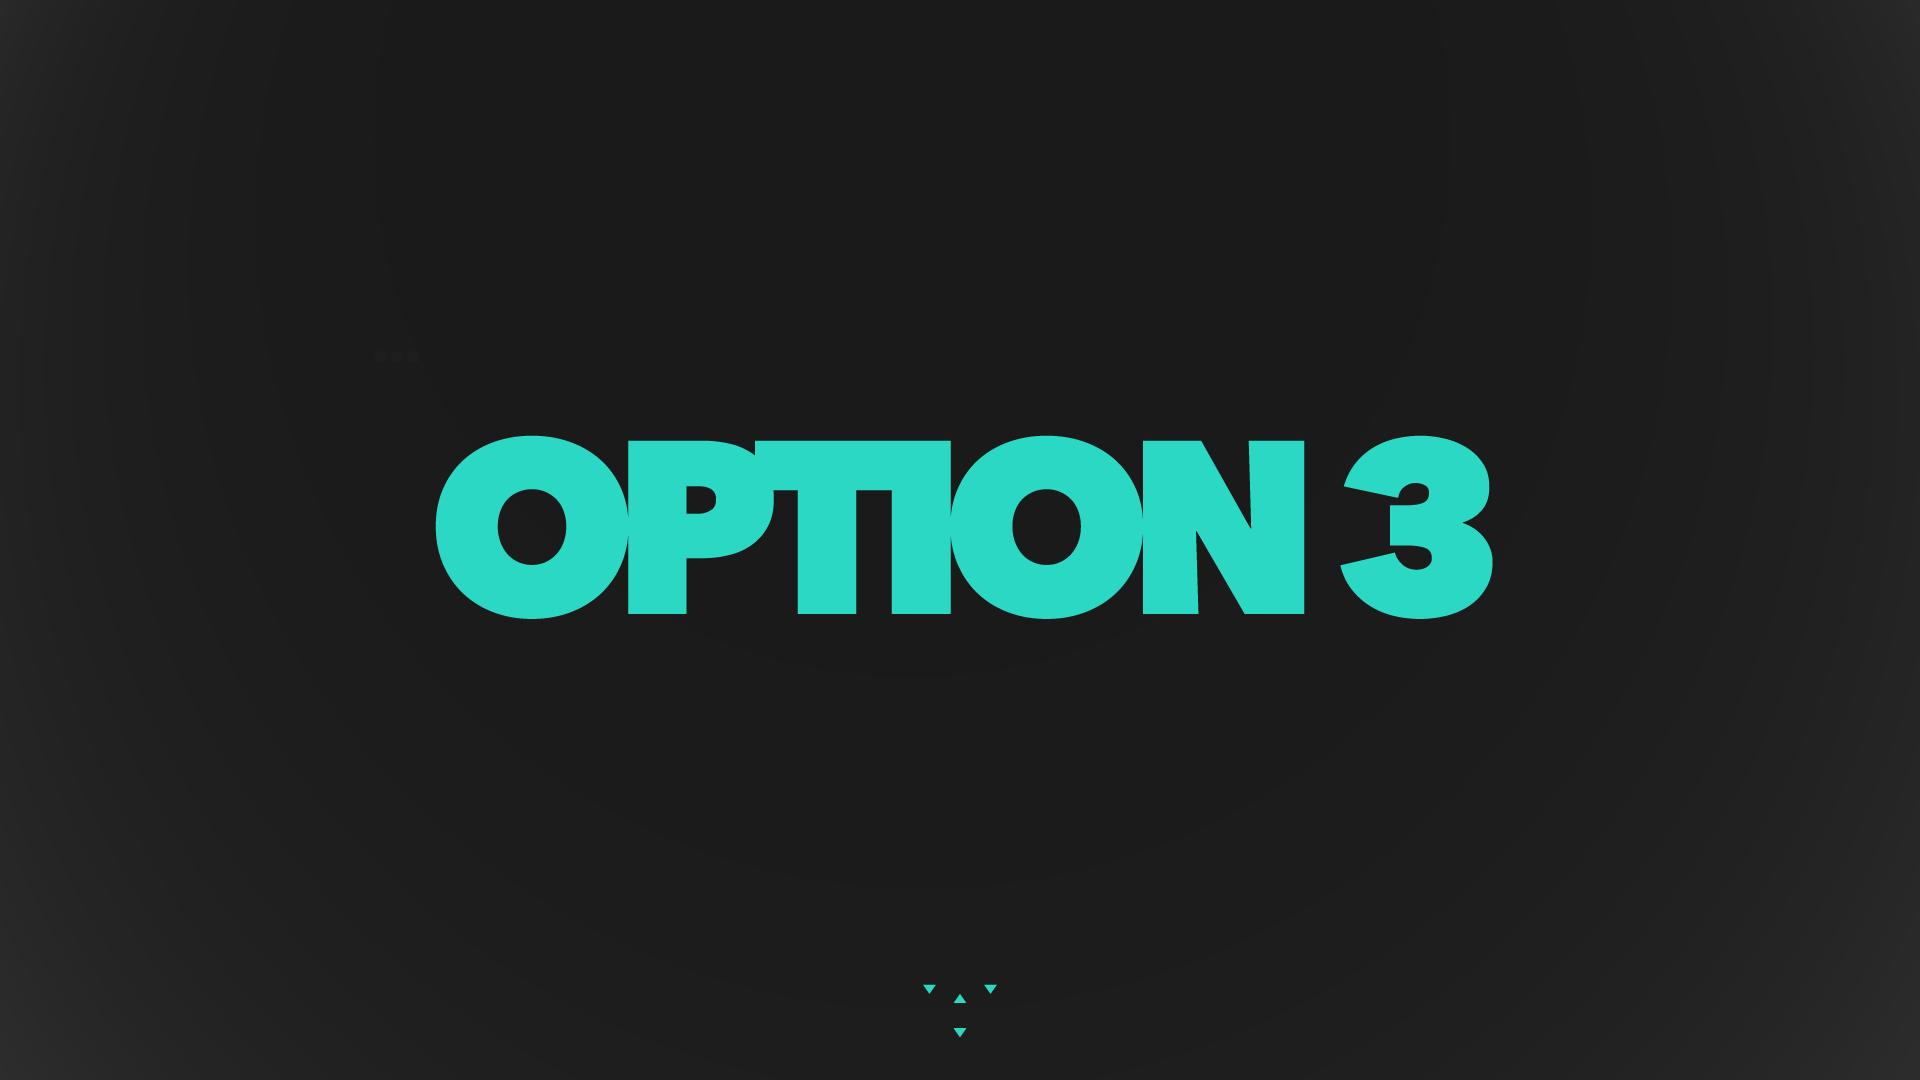 03_option3.png